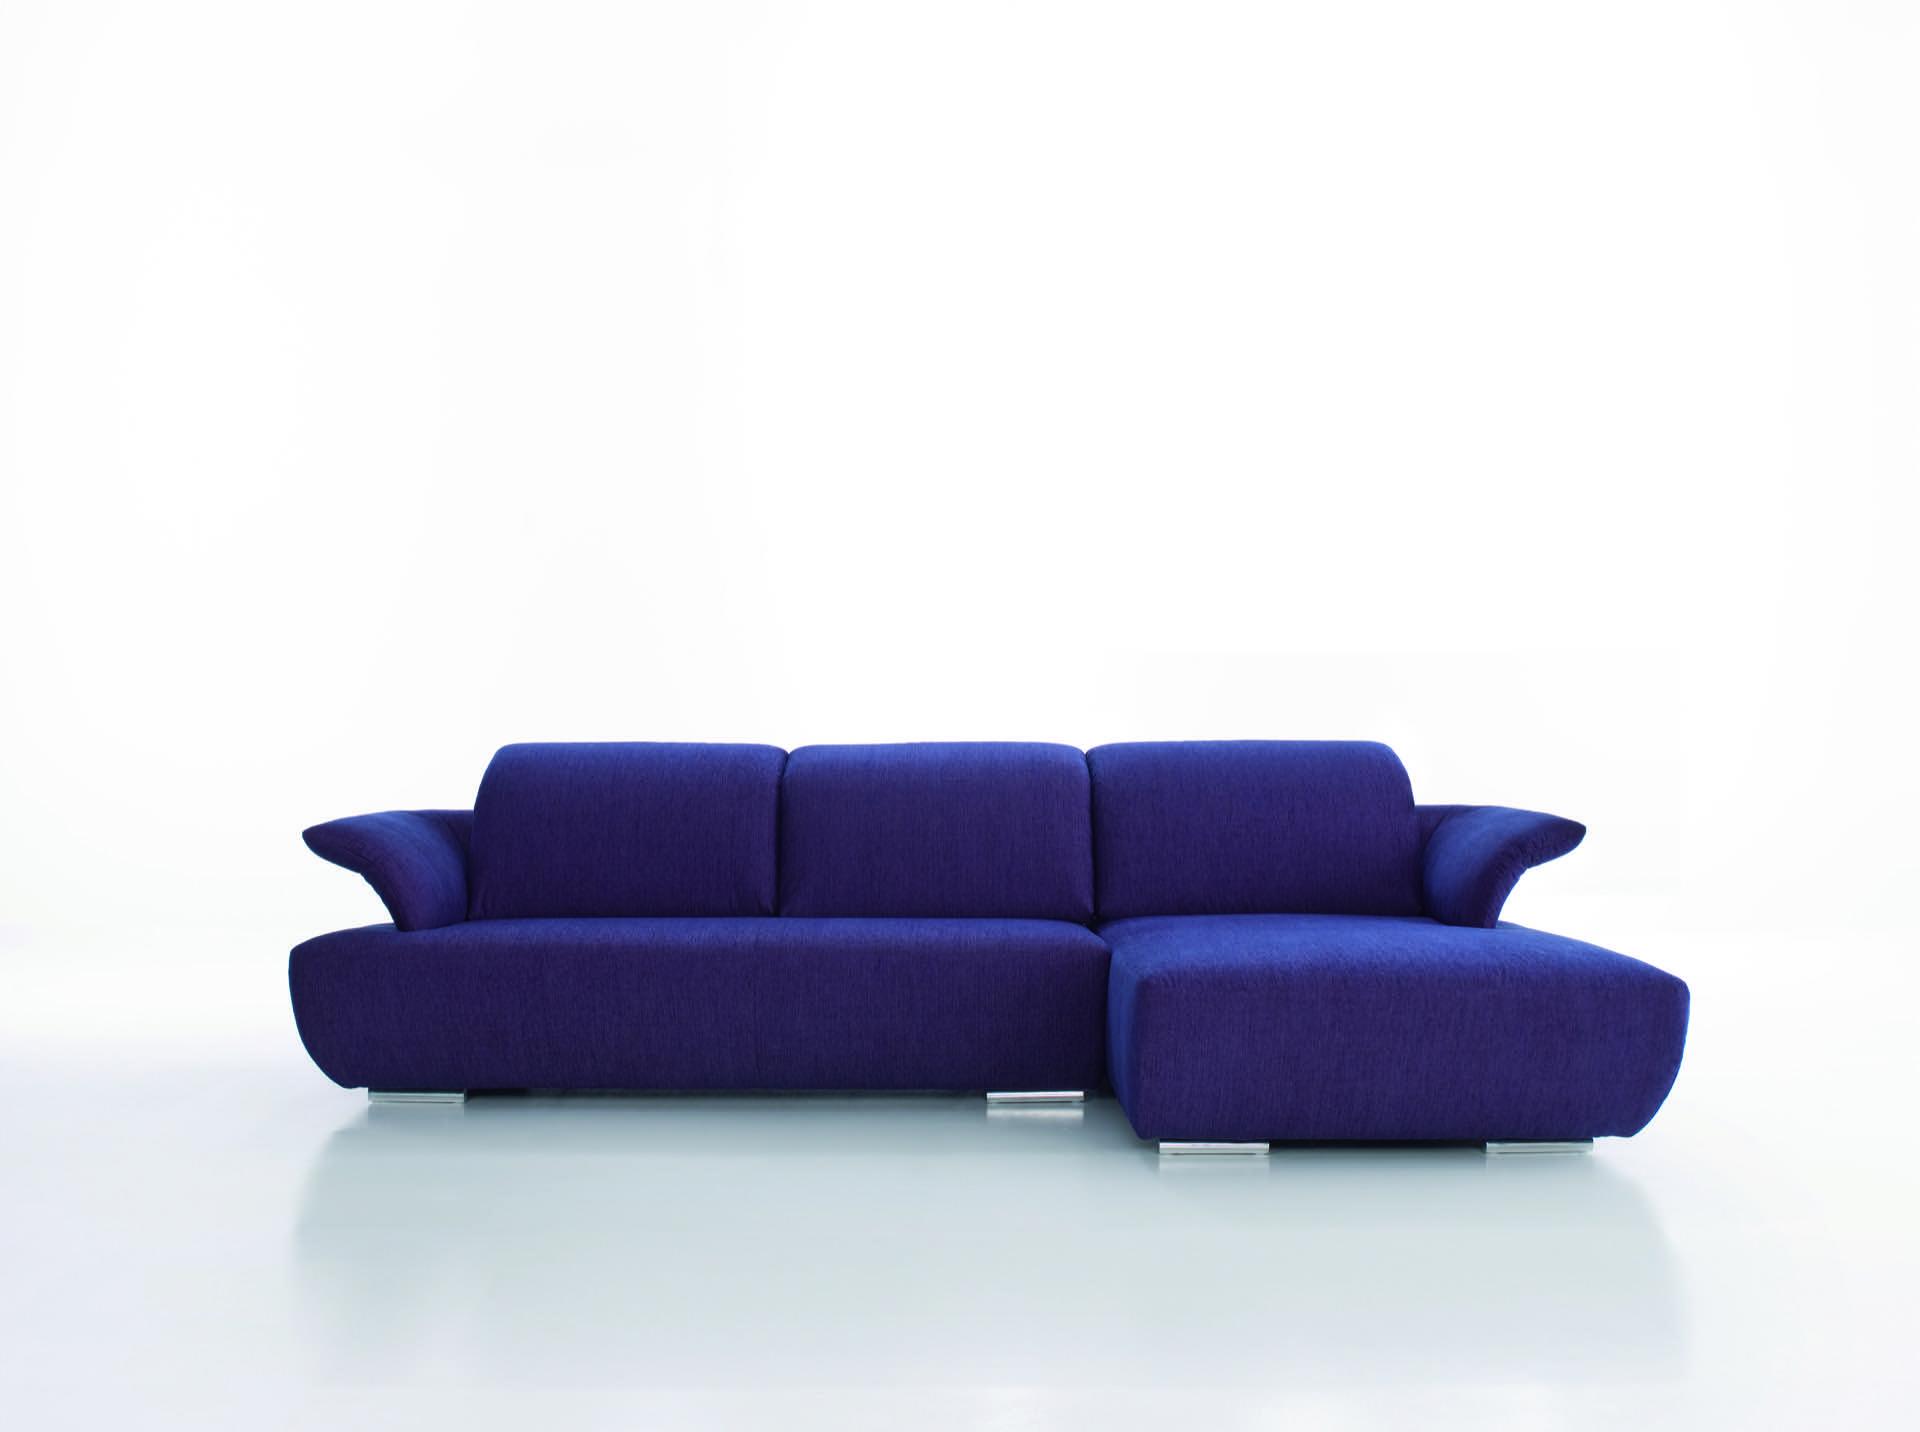 couch ecke beautiful couchecke mit cm breit with couch ecke ledersofa ecksofa ii schwarz ecke. Black Bedroom Furniture Sets. Home Design Ideas